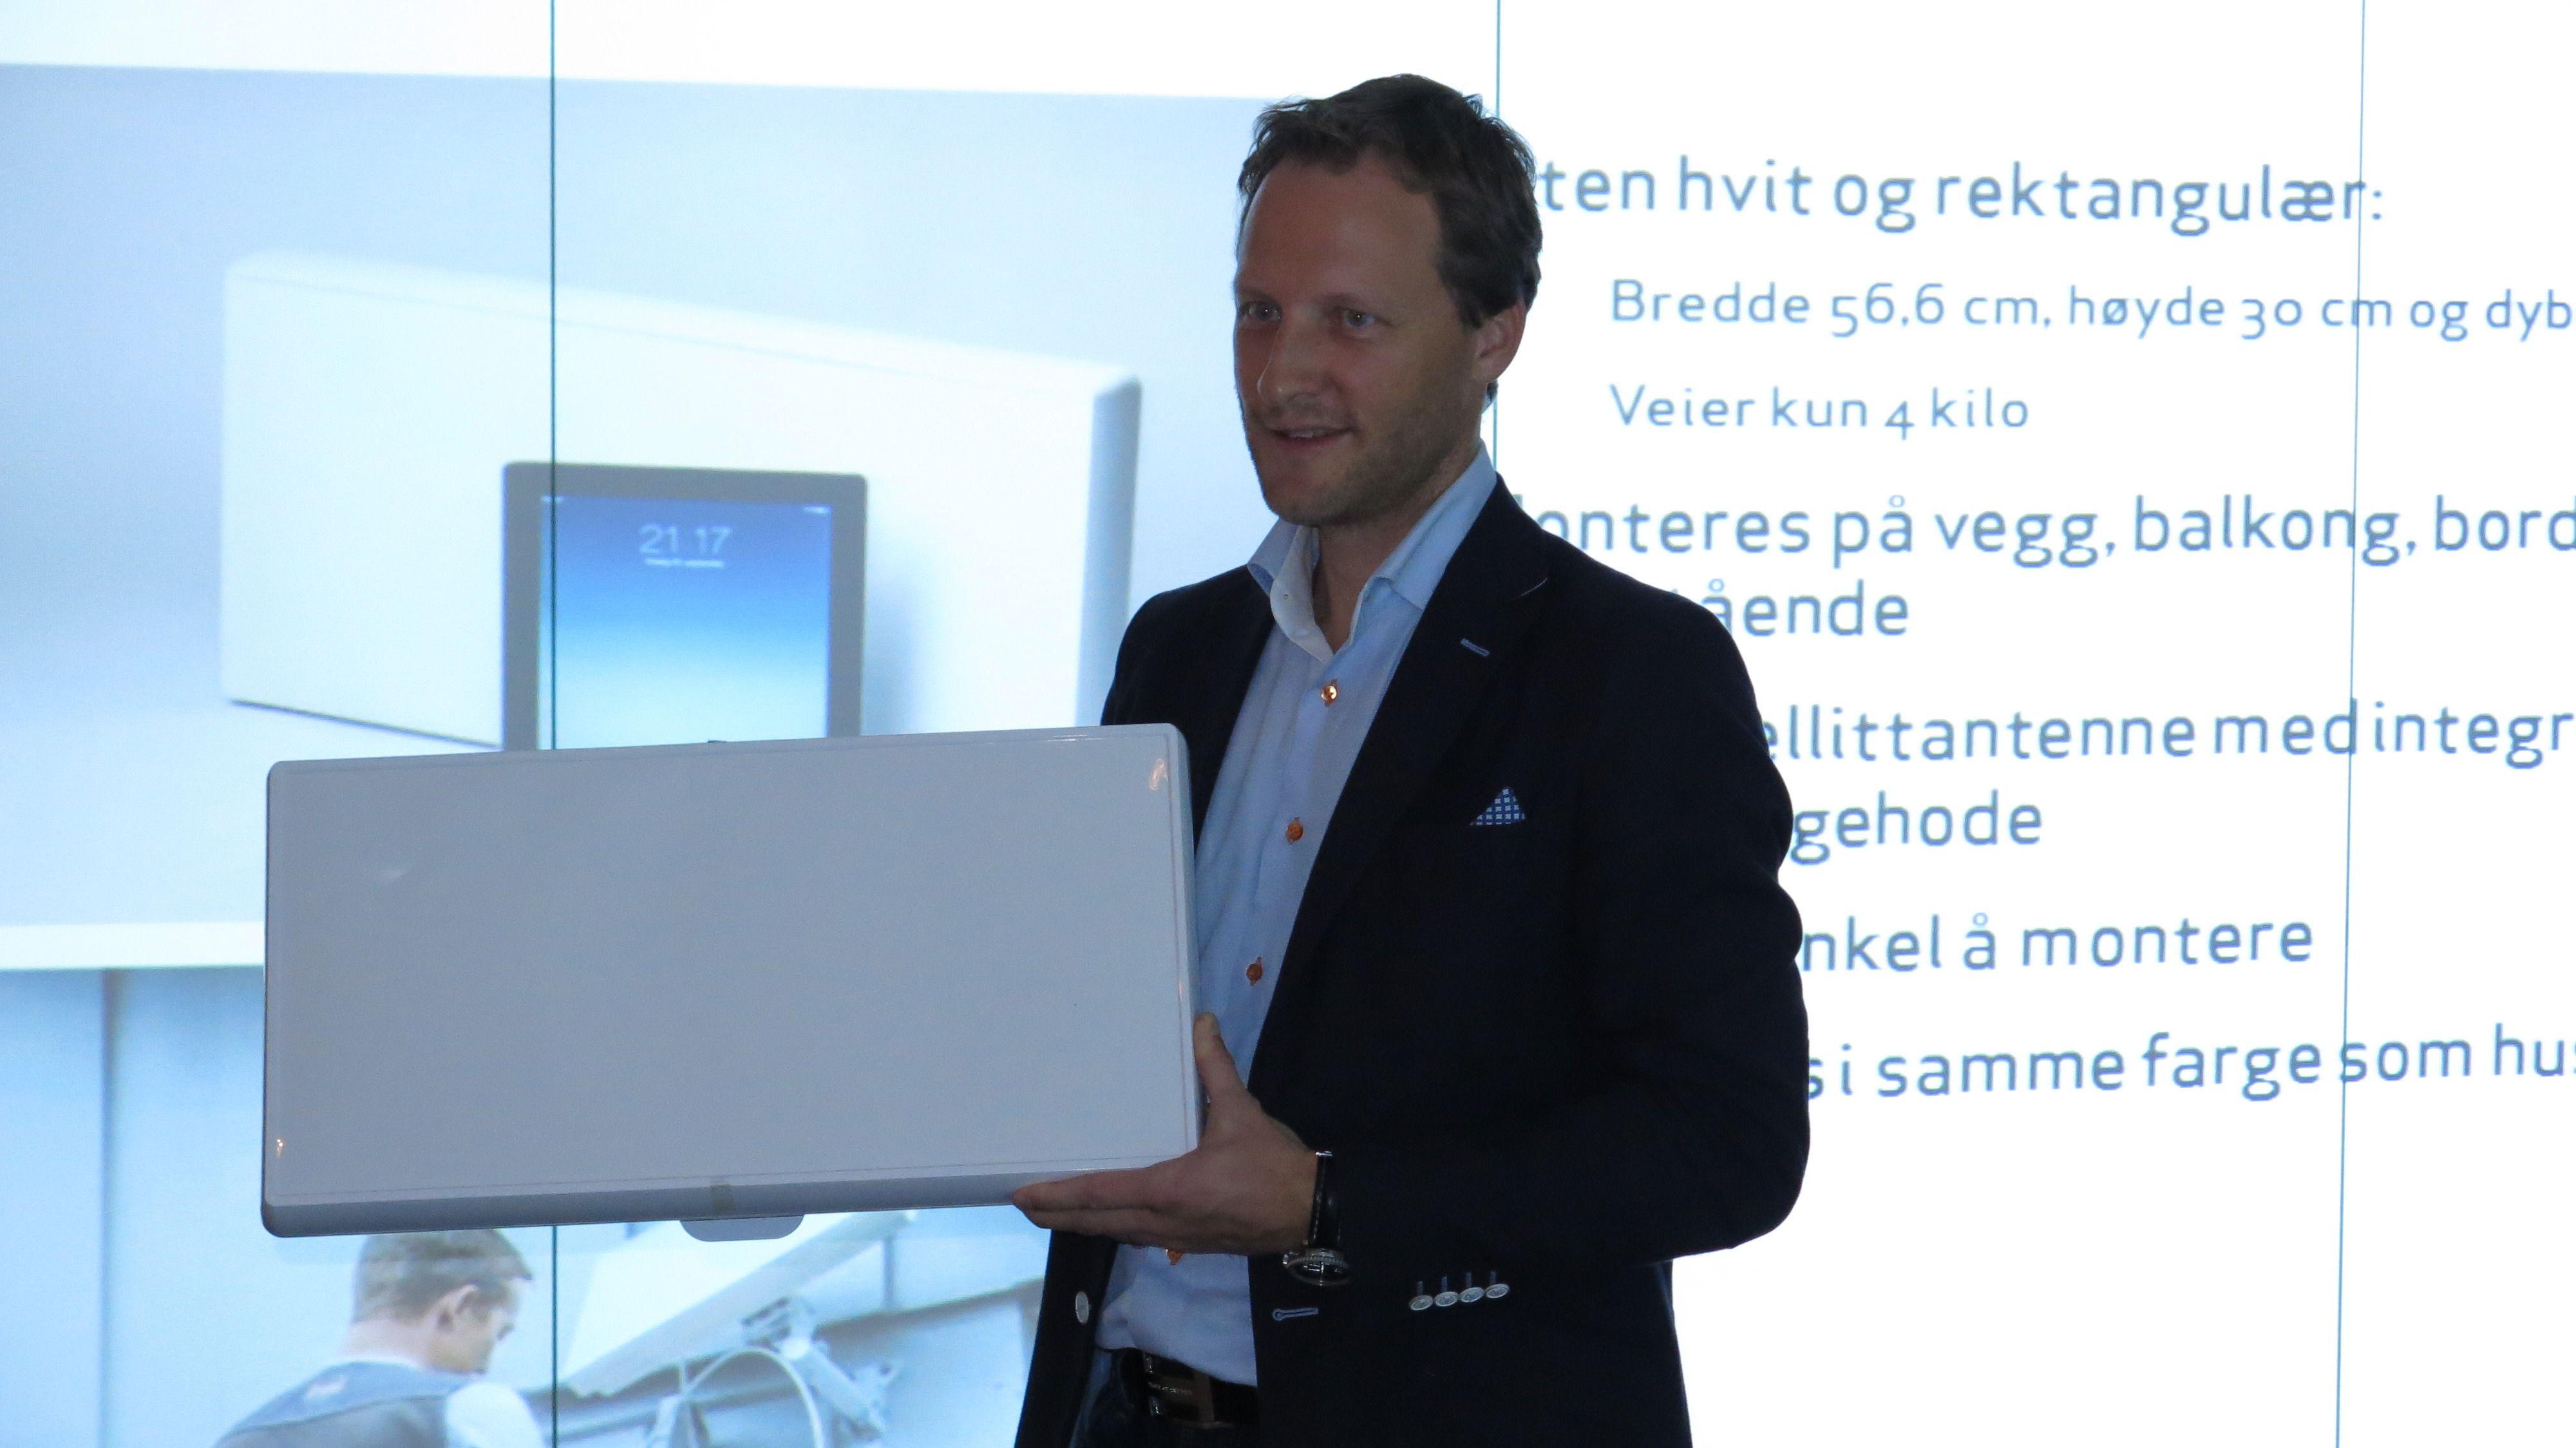 Denne plate antennen er Canal Digitals nye alternativ.Foto: Ole Henrik Johansen / Tek.no